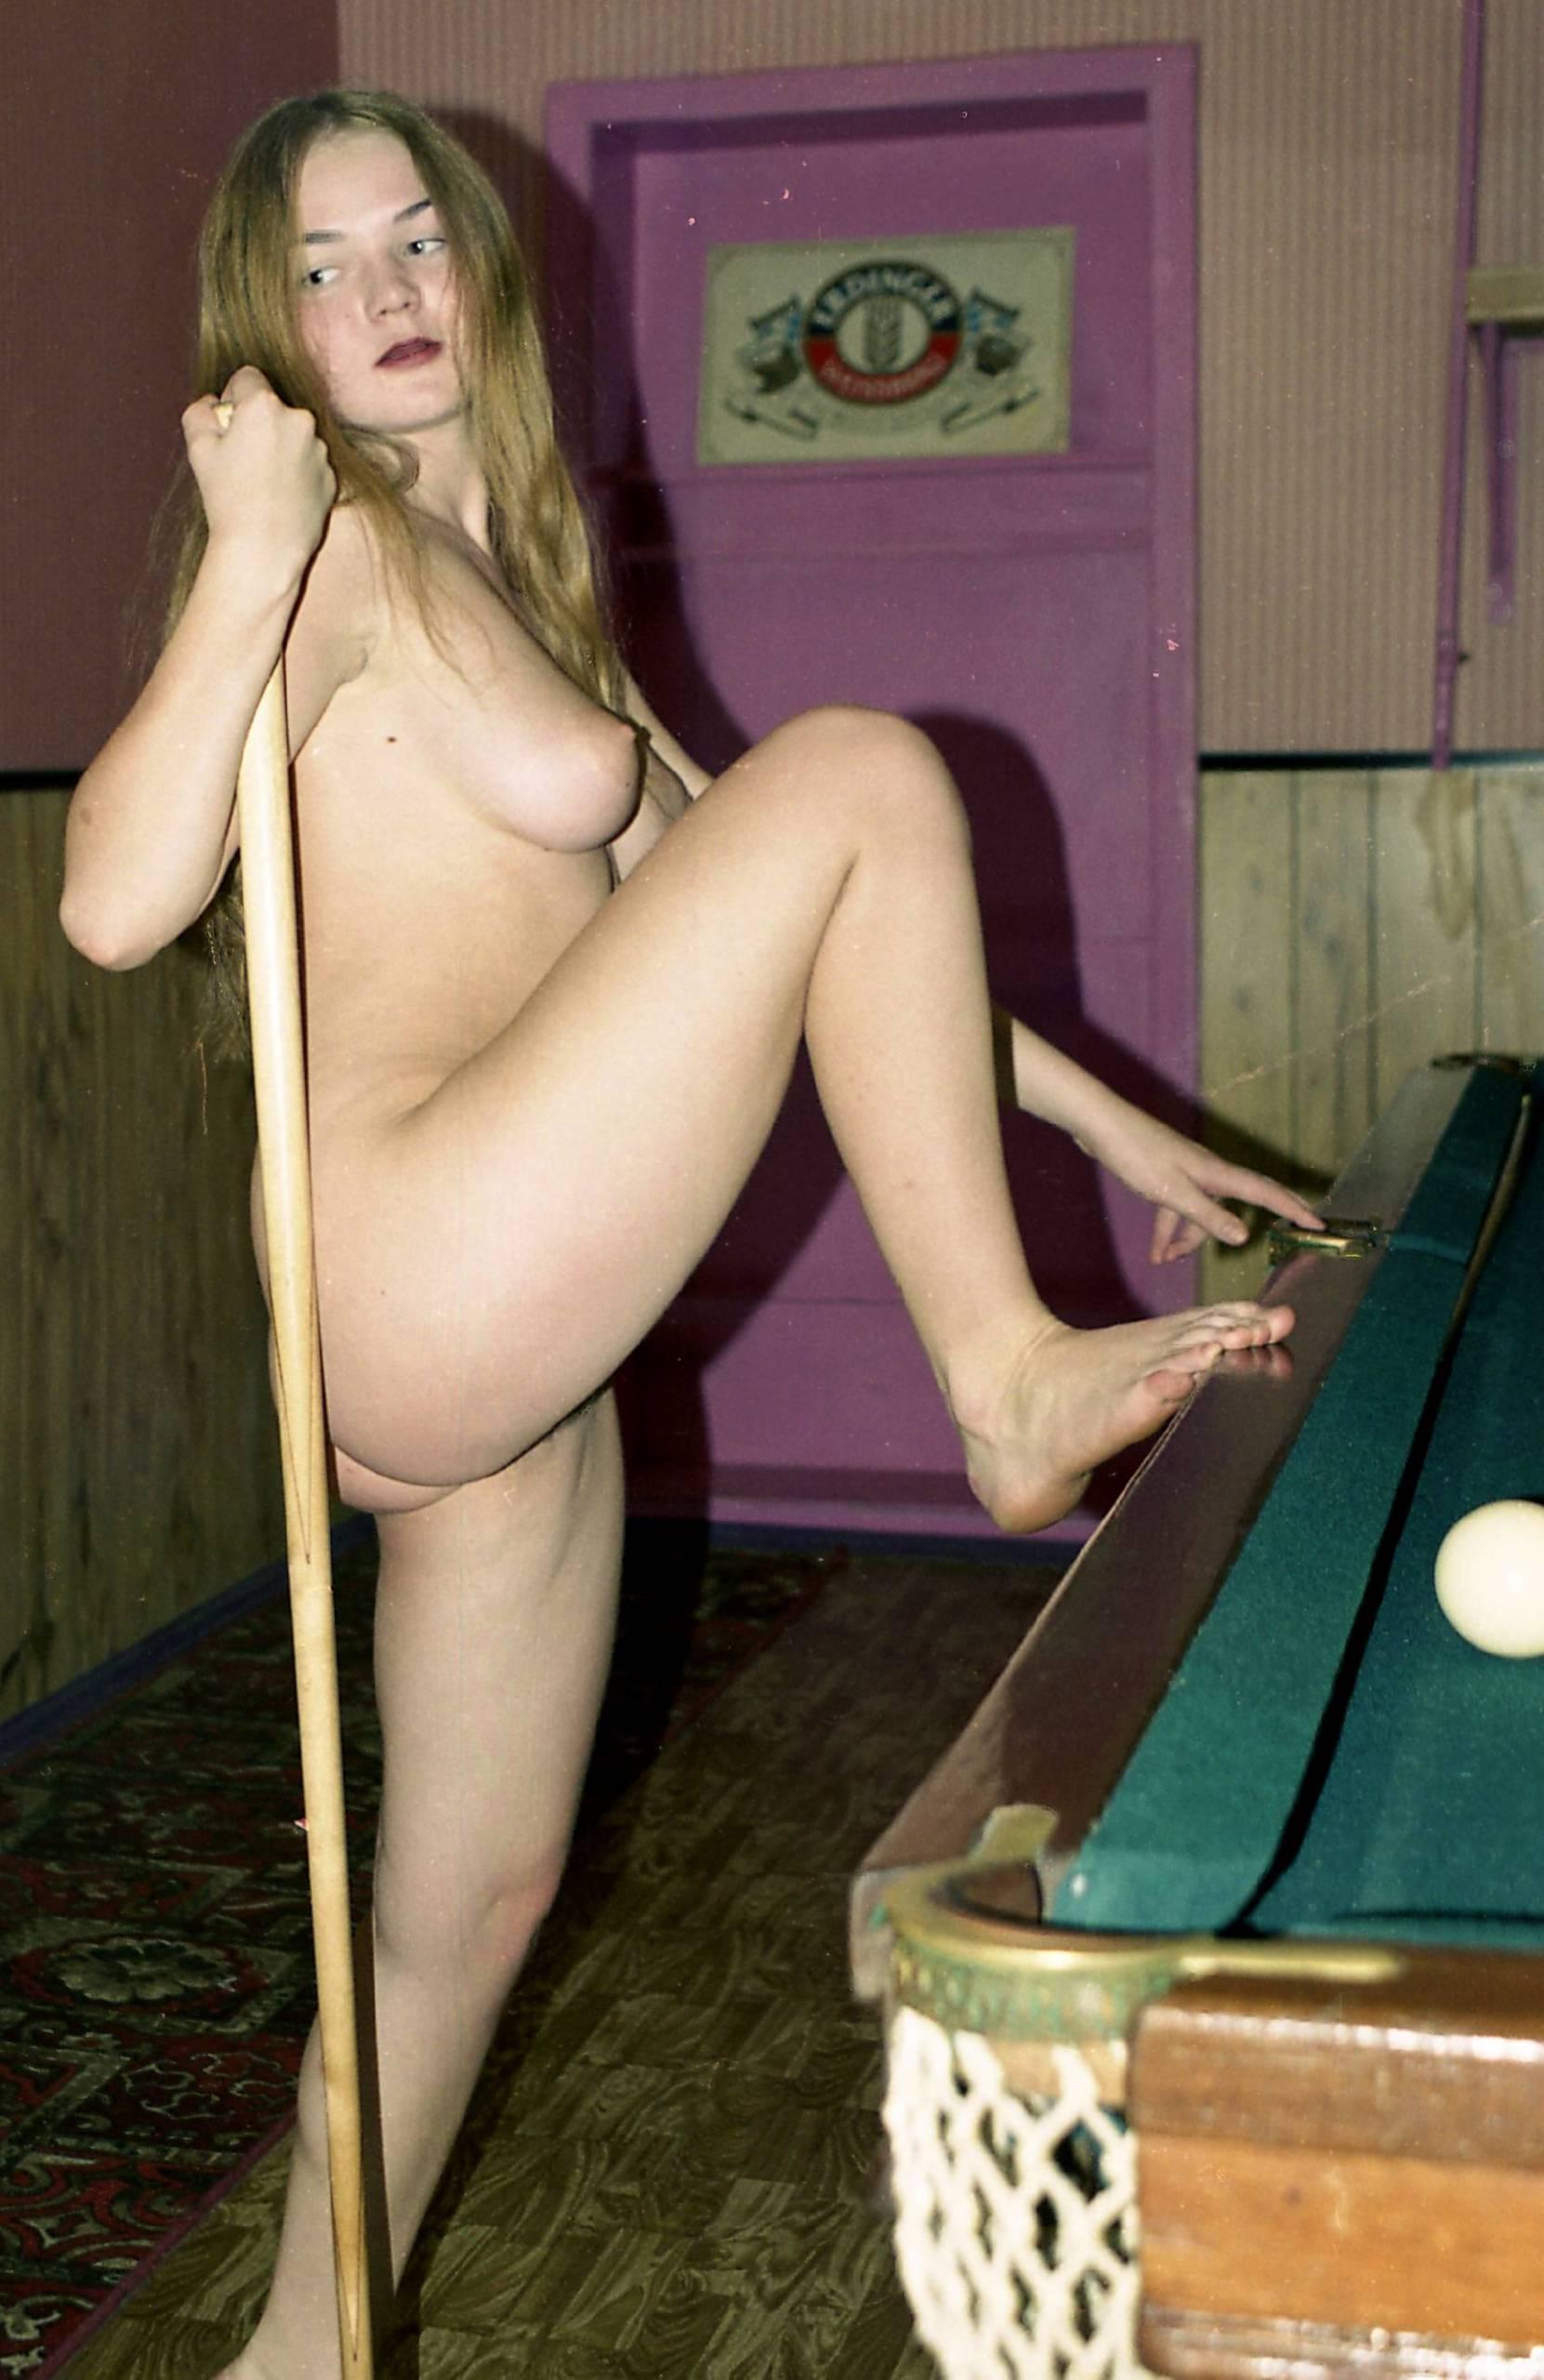 Pleasant Billiard Games - 1